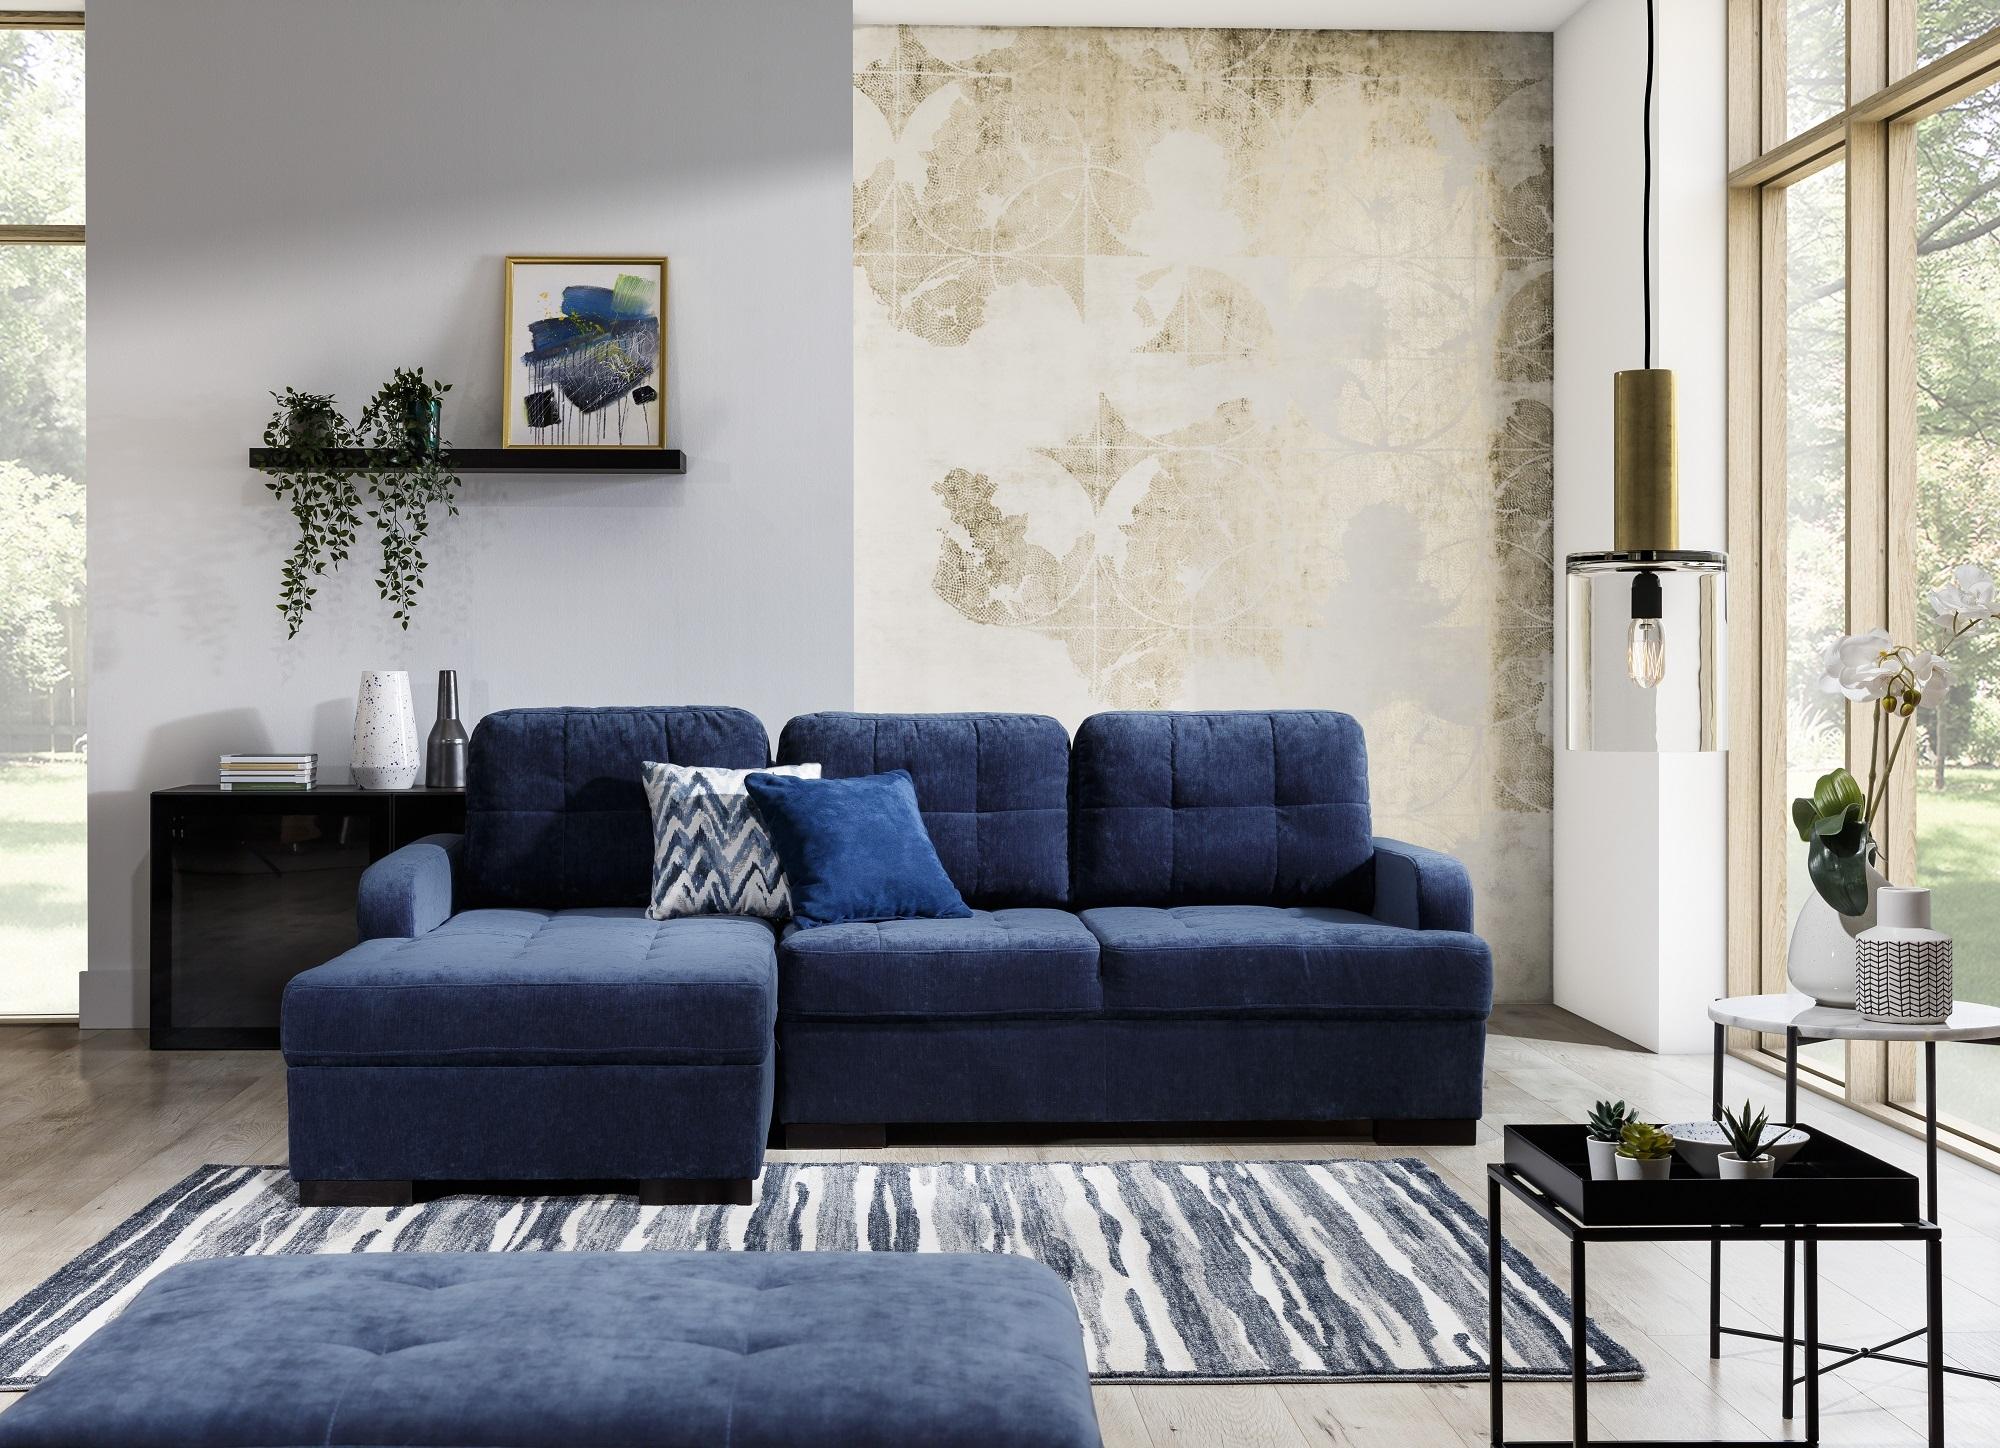 Coltar extensibil cu lada de depozitare, cu sezlong pe stanga, tapitat cu stofa, Catanzaro Bleumarin, l225xA160xH87 cm